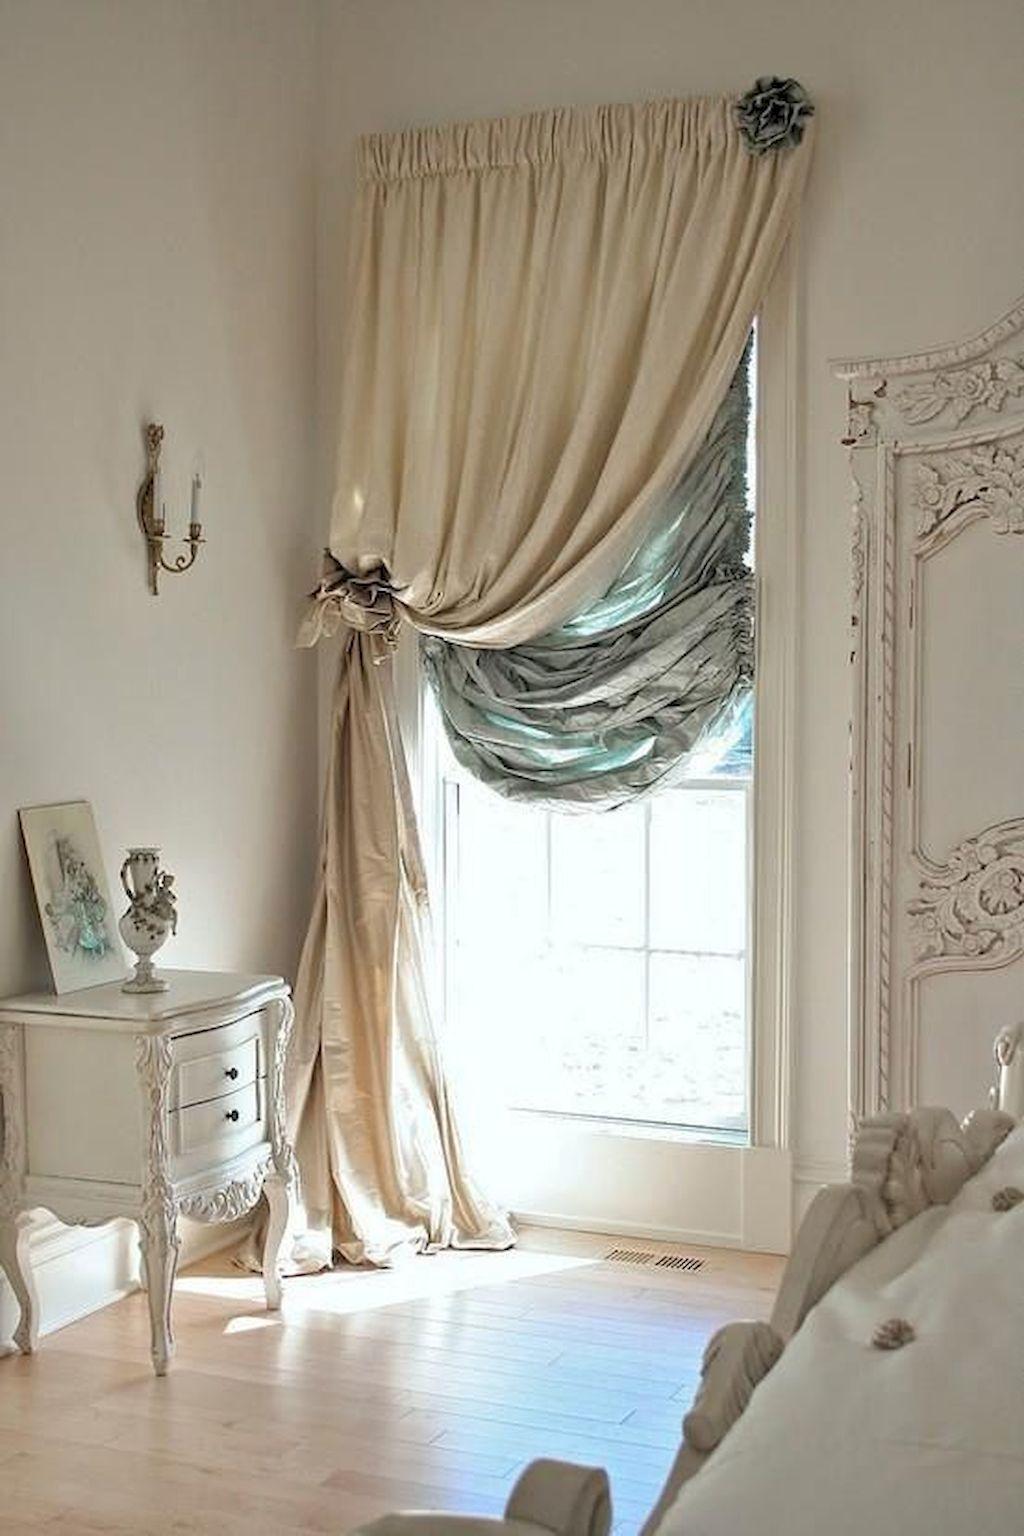 55 Fresh French Country Bedroom Decor Ideas - homixover.com